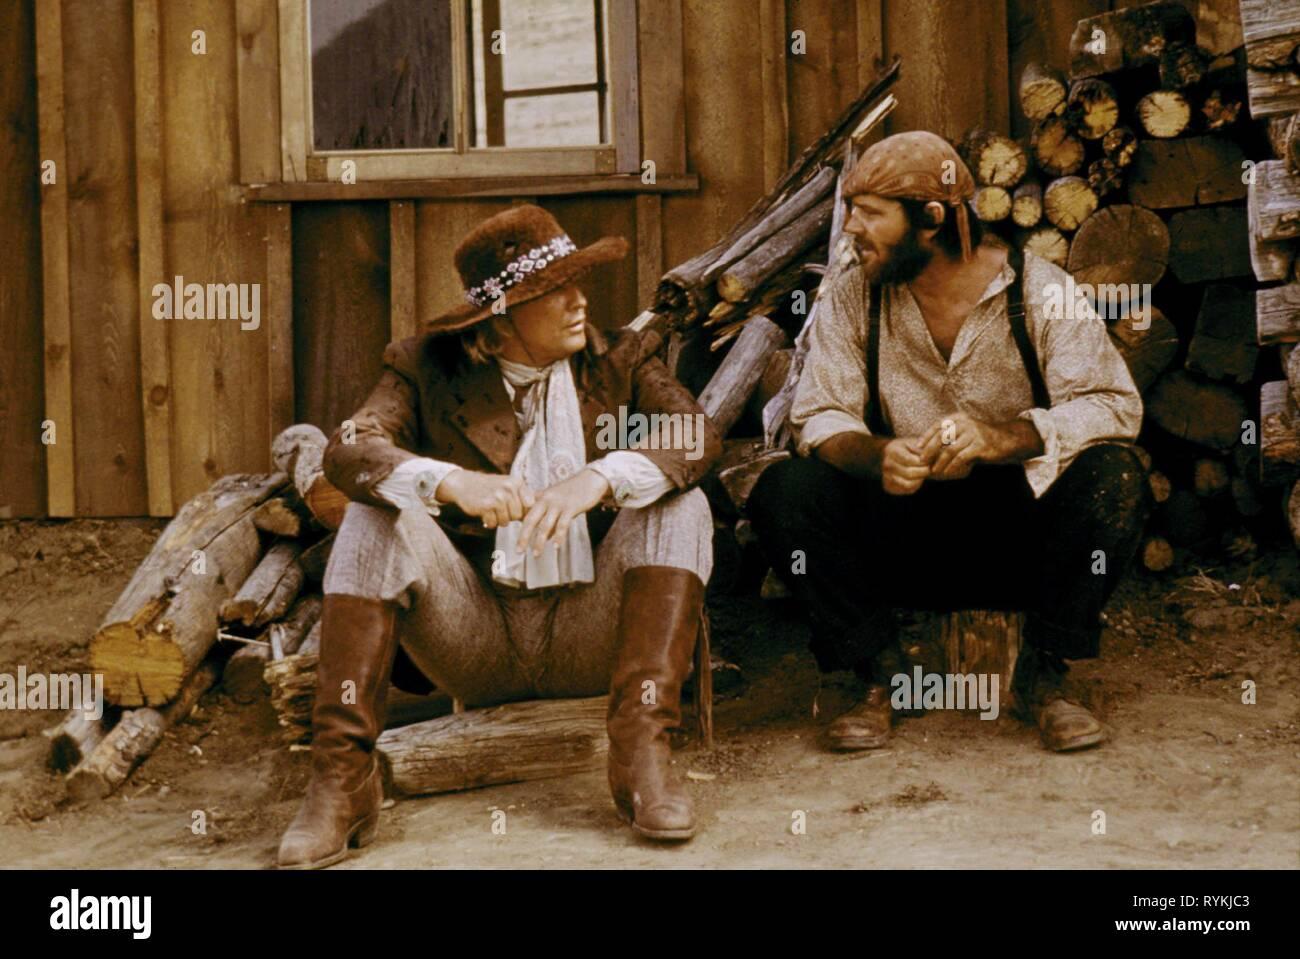 BRANDO,NICHOLSON, THE MISSOURI BREAKS, 1976 - Stock Image